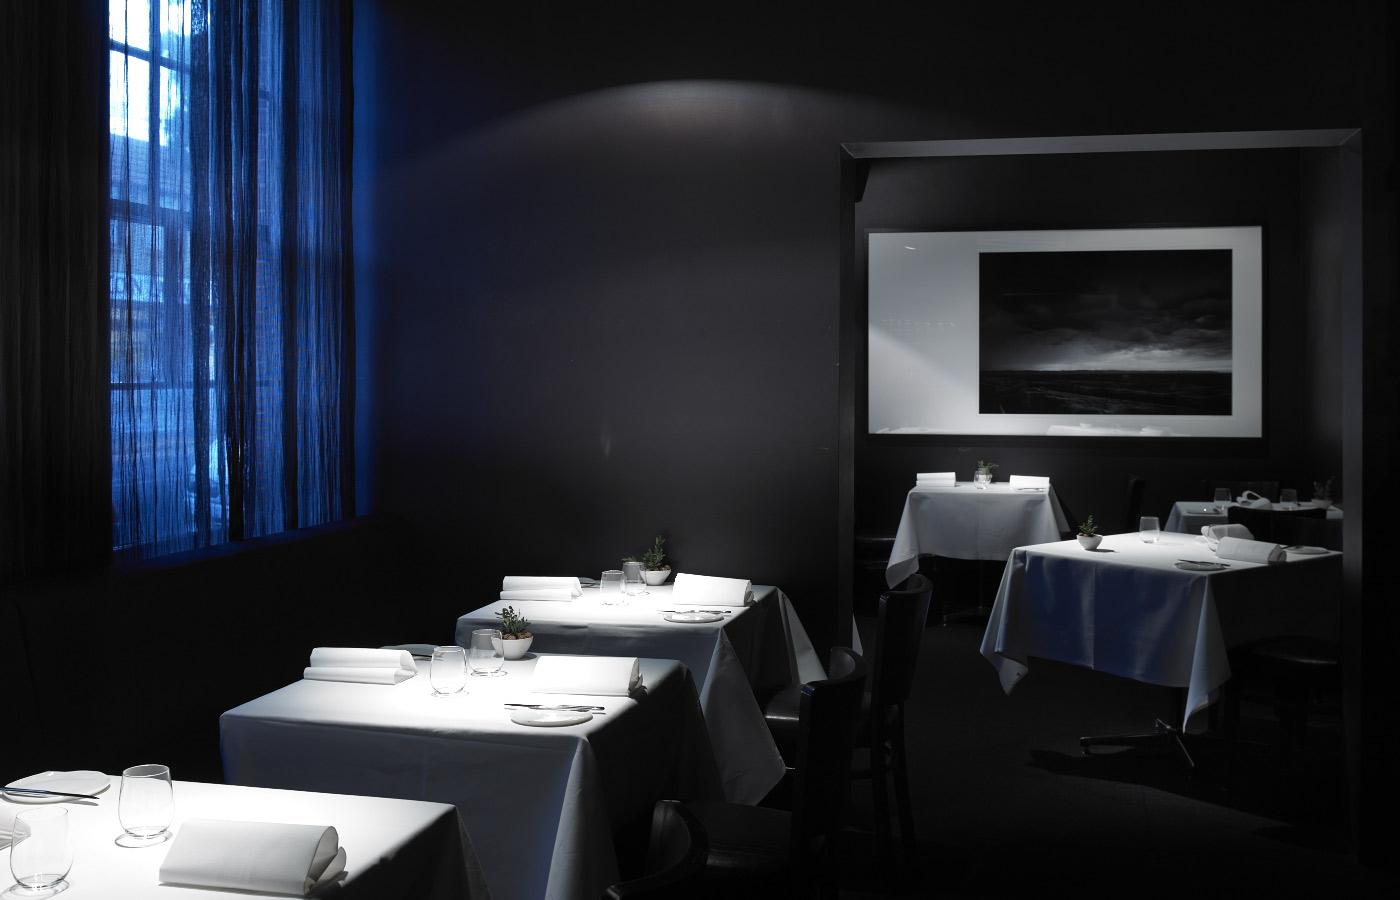 restaurantfurniturearoundtheworld1.jpg